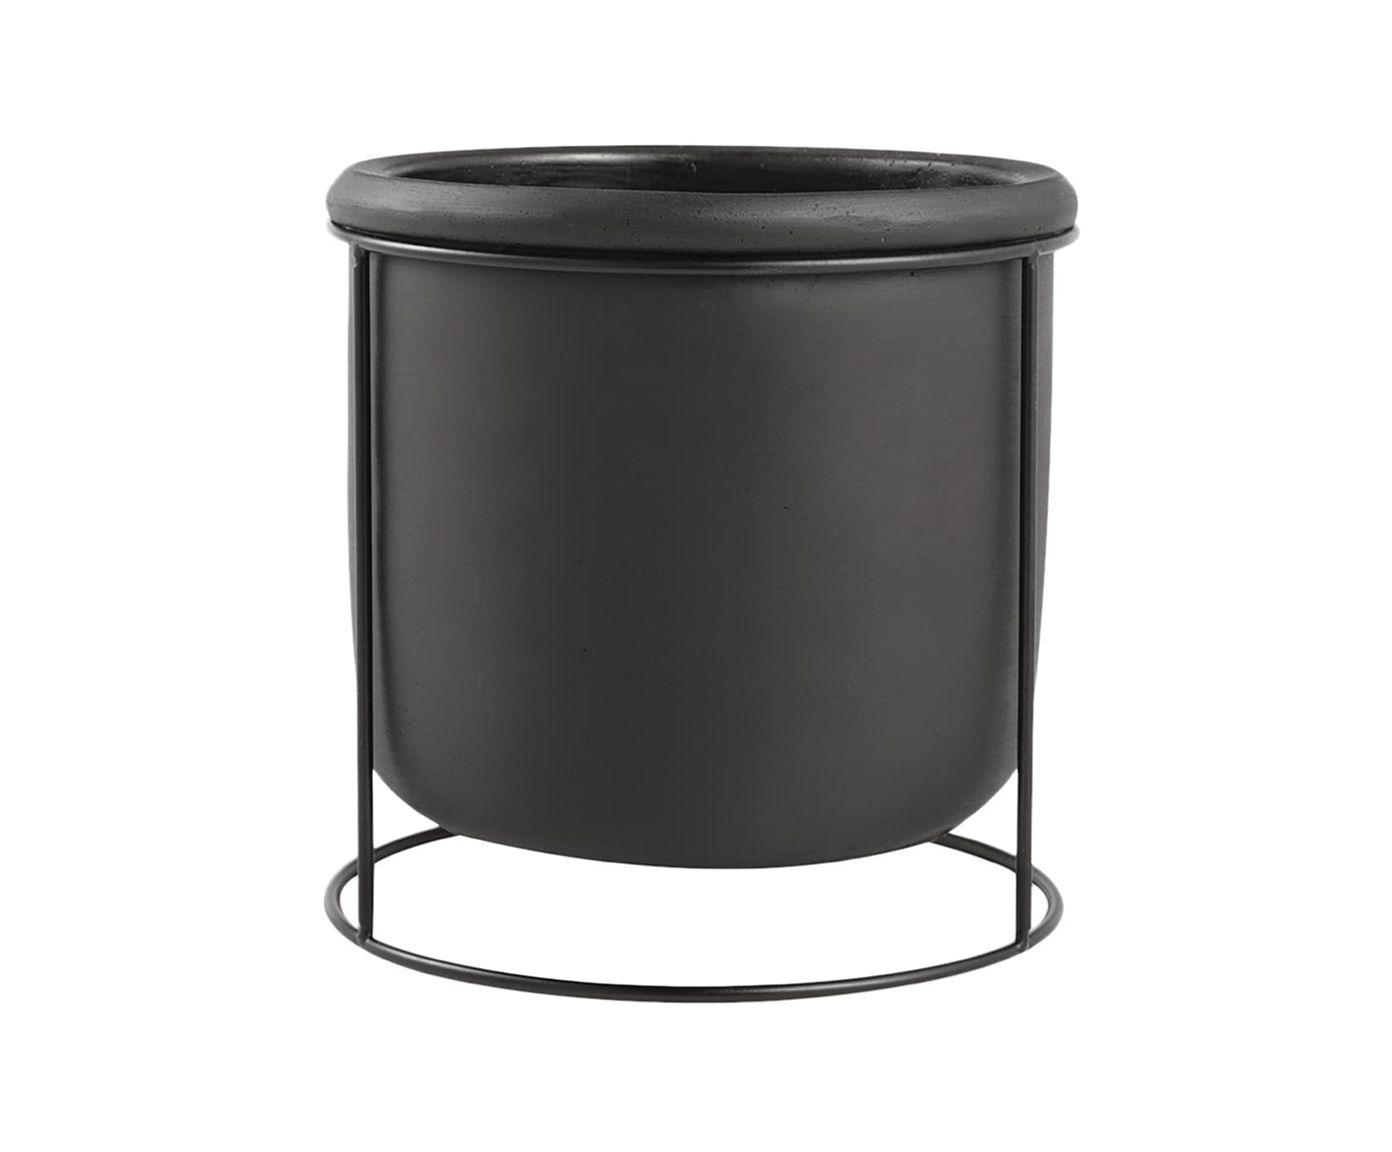 Cachepot com Suporte Syn - 14,5X15cm | Westwing.com.br